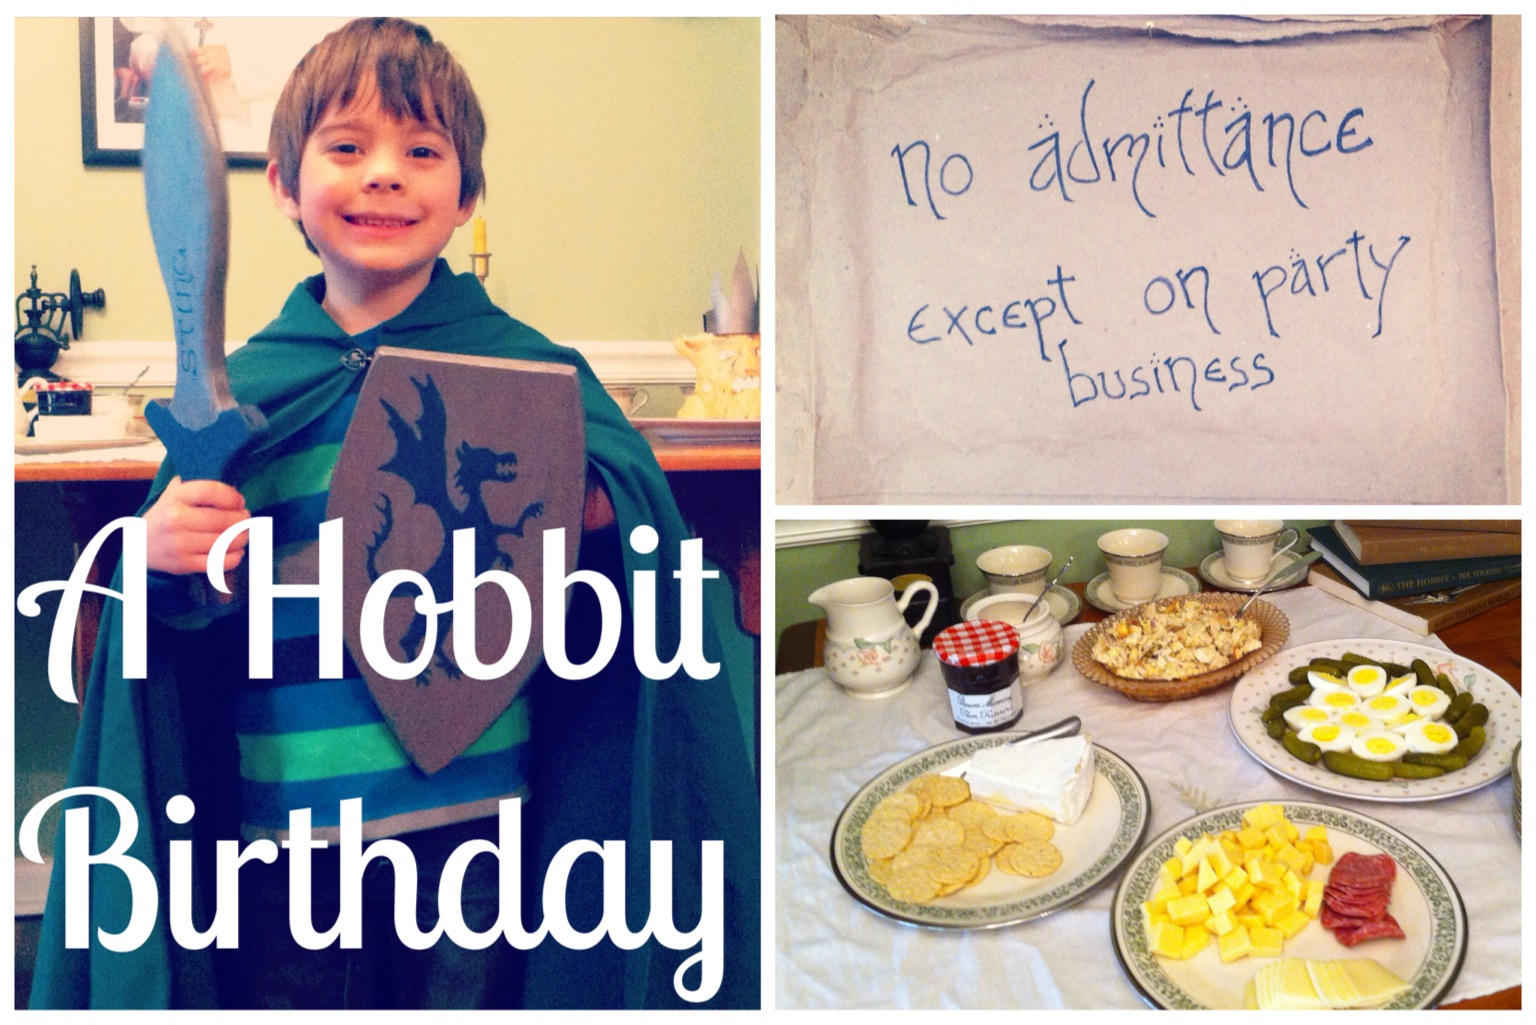 A Hobbit Birthday